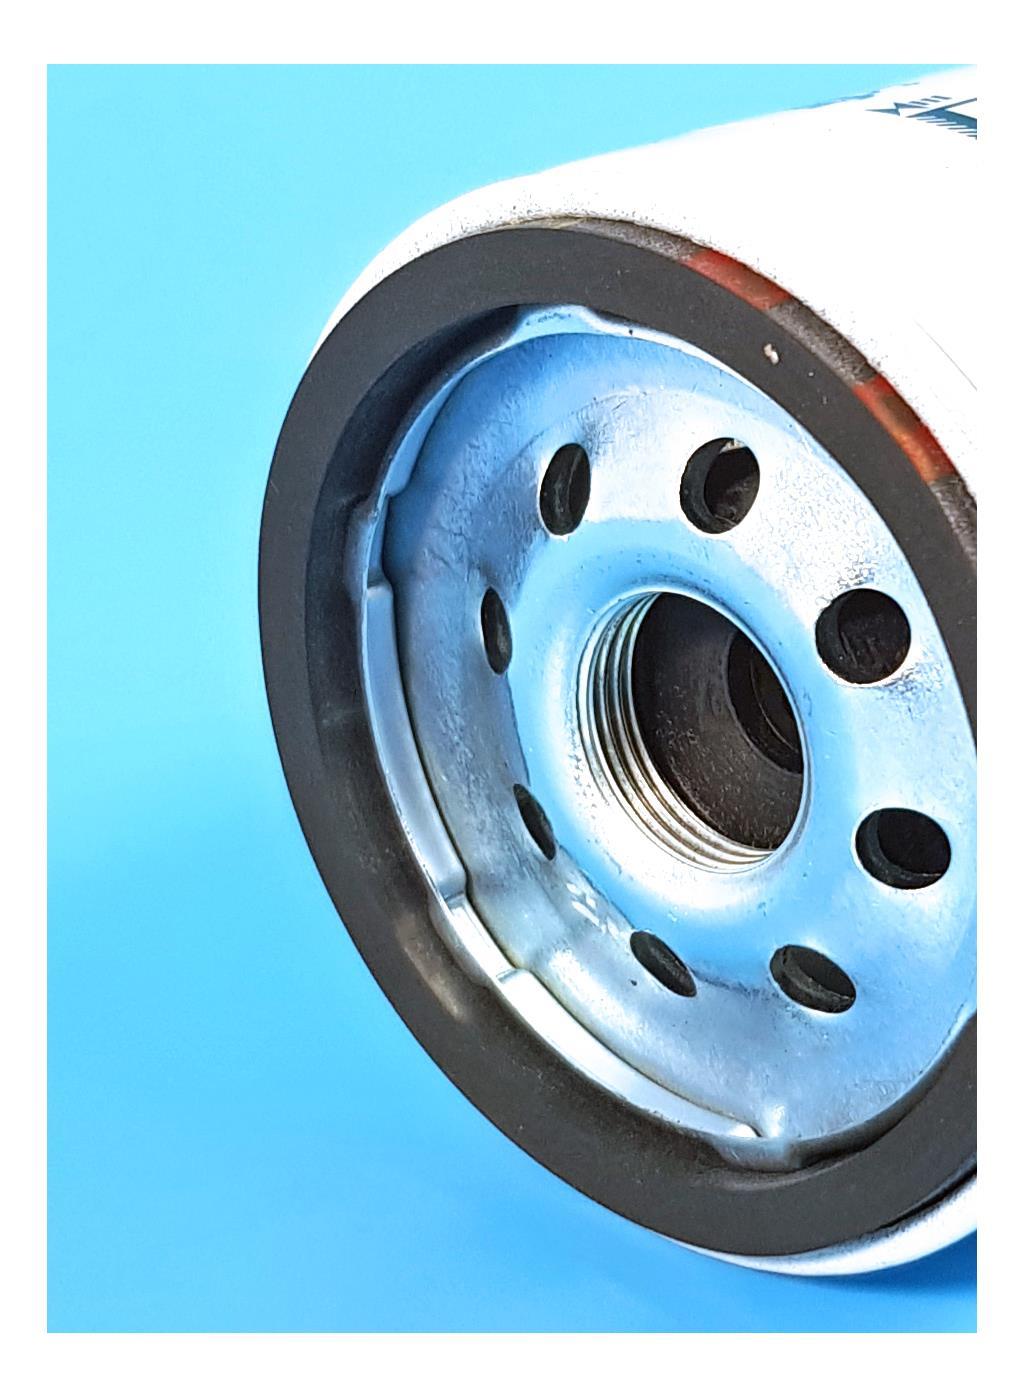 Evinrude 5011090  Fuel Filter  - Image 3